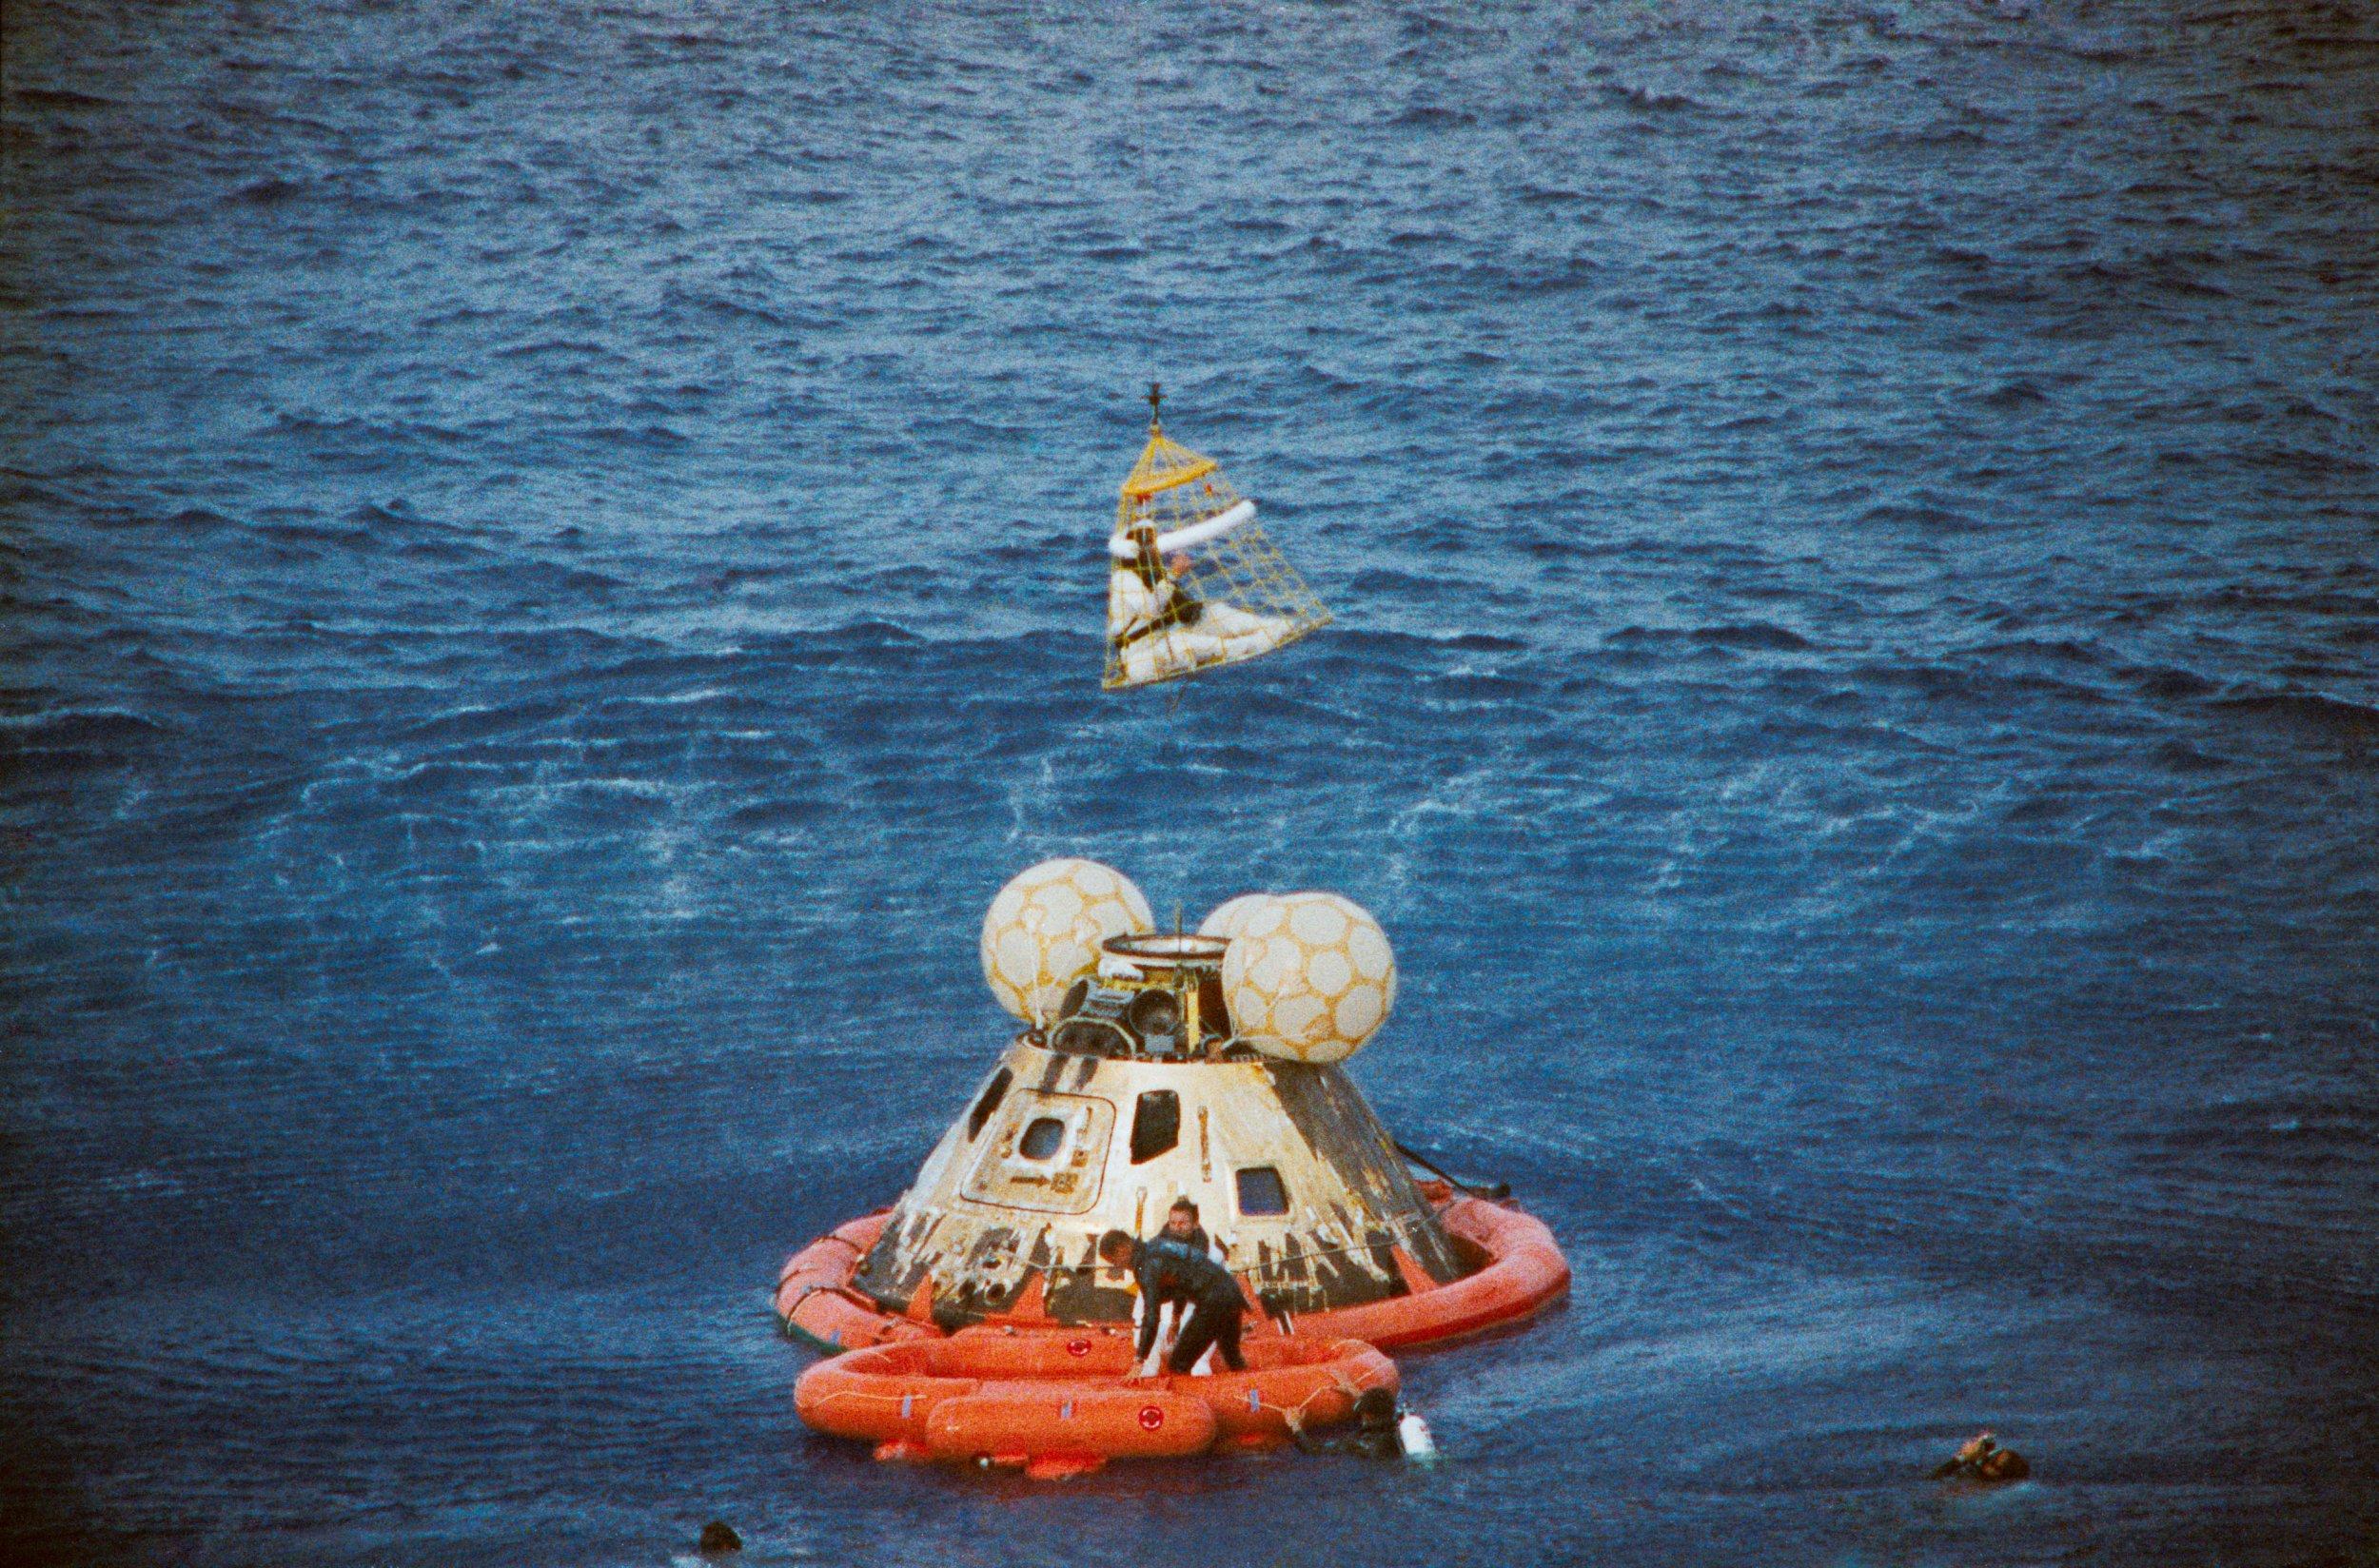 Apollo 13 Timeline: Follow Key Moments of Failed NASA